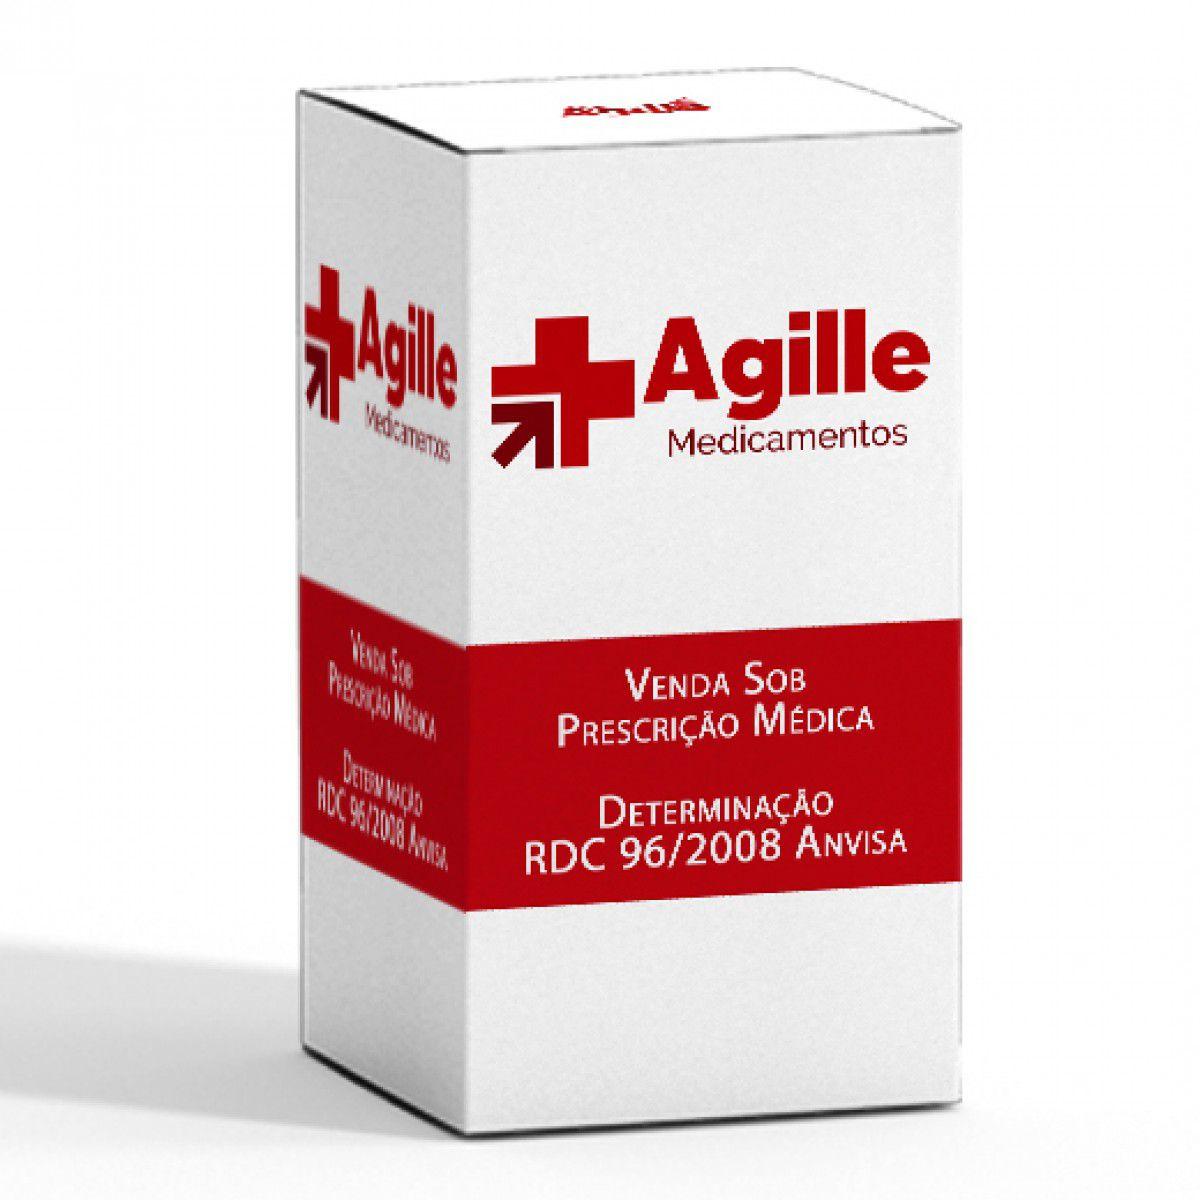 PUREGON 50UI SOL INJ CX 1FA X 0,5ML  - Agille Speciality